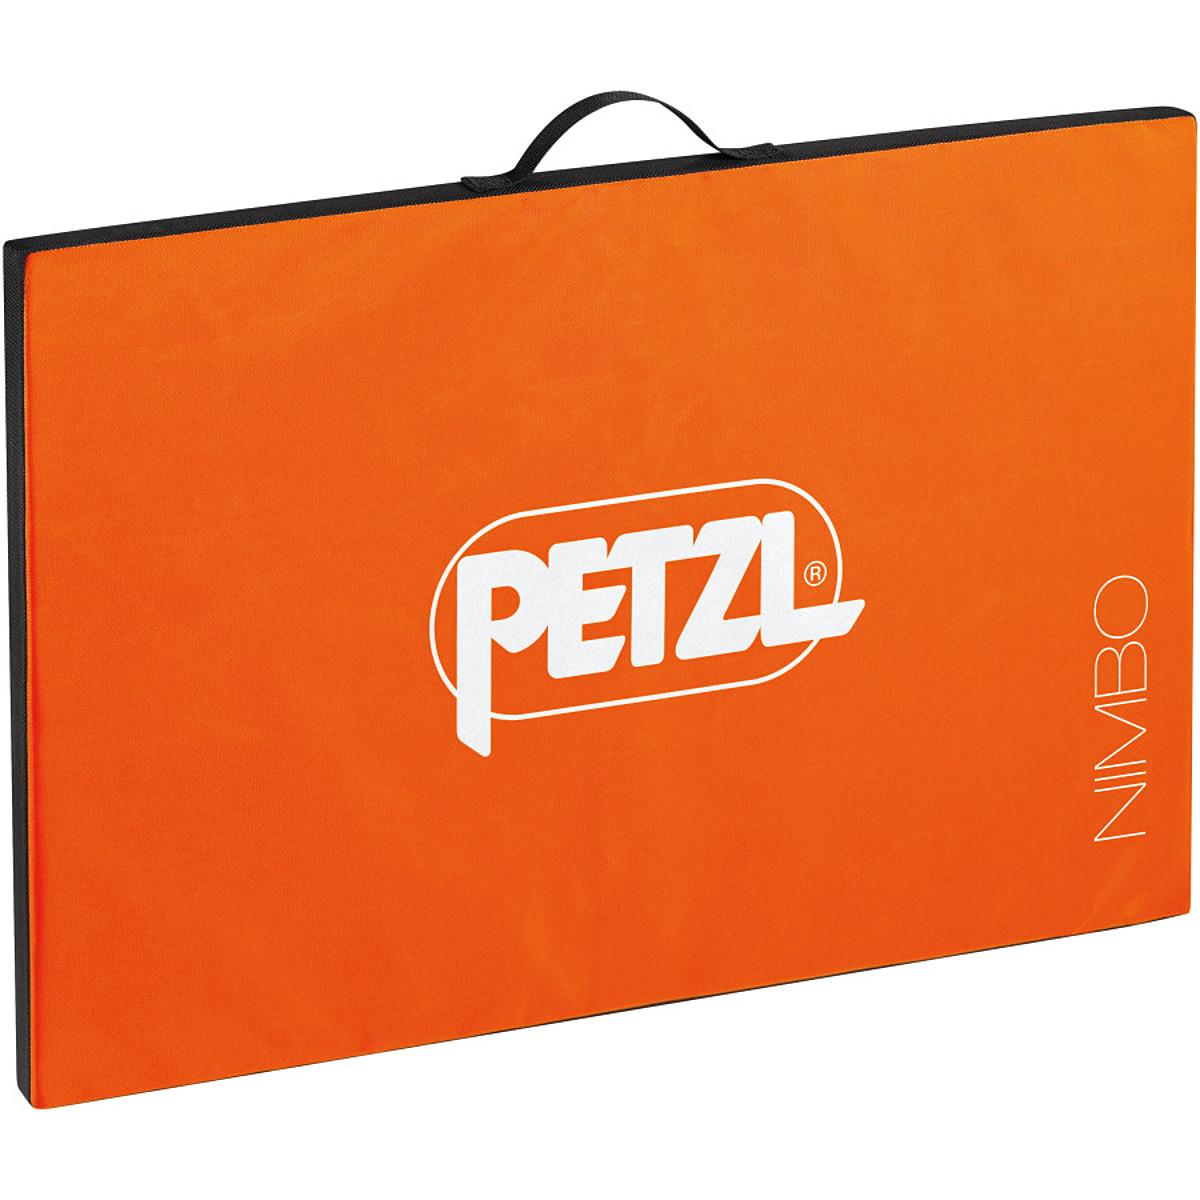 Petzl Nimbo Lightweight Auxiliary Crashpad